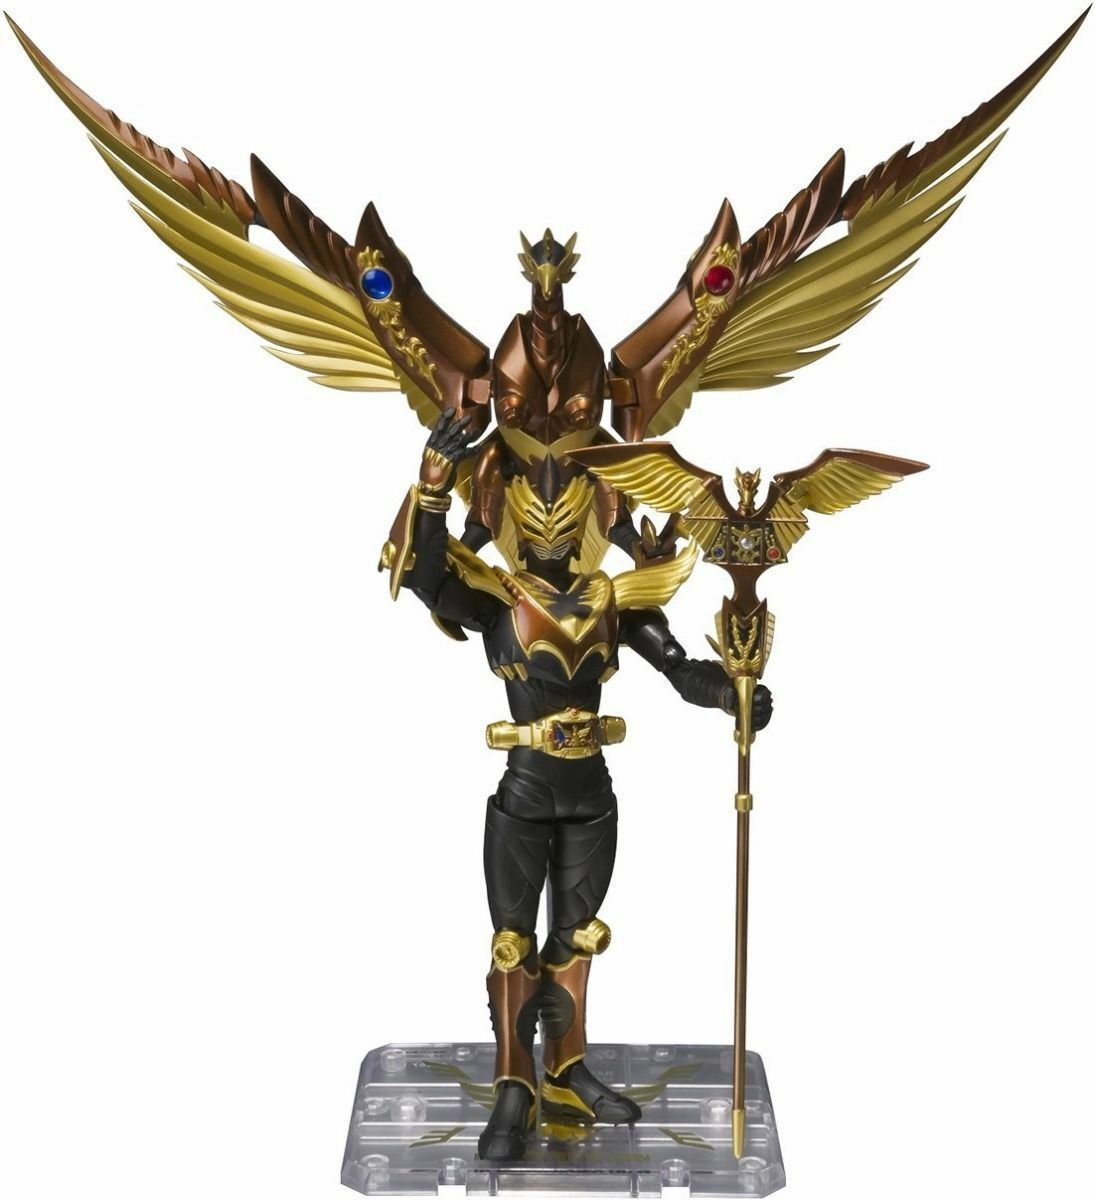 S.H.Figuarts Masked Masked Masked Kamen Rider Ryuki ODIN & gold PHOENIX Action Figure BANDAI 1bc5e3